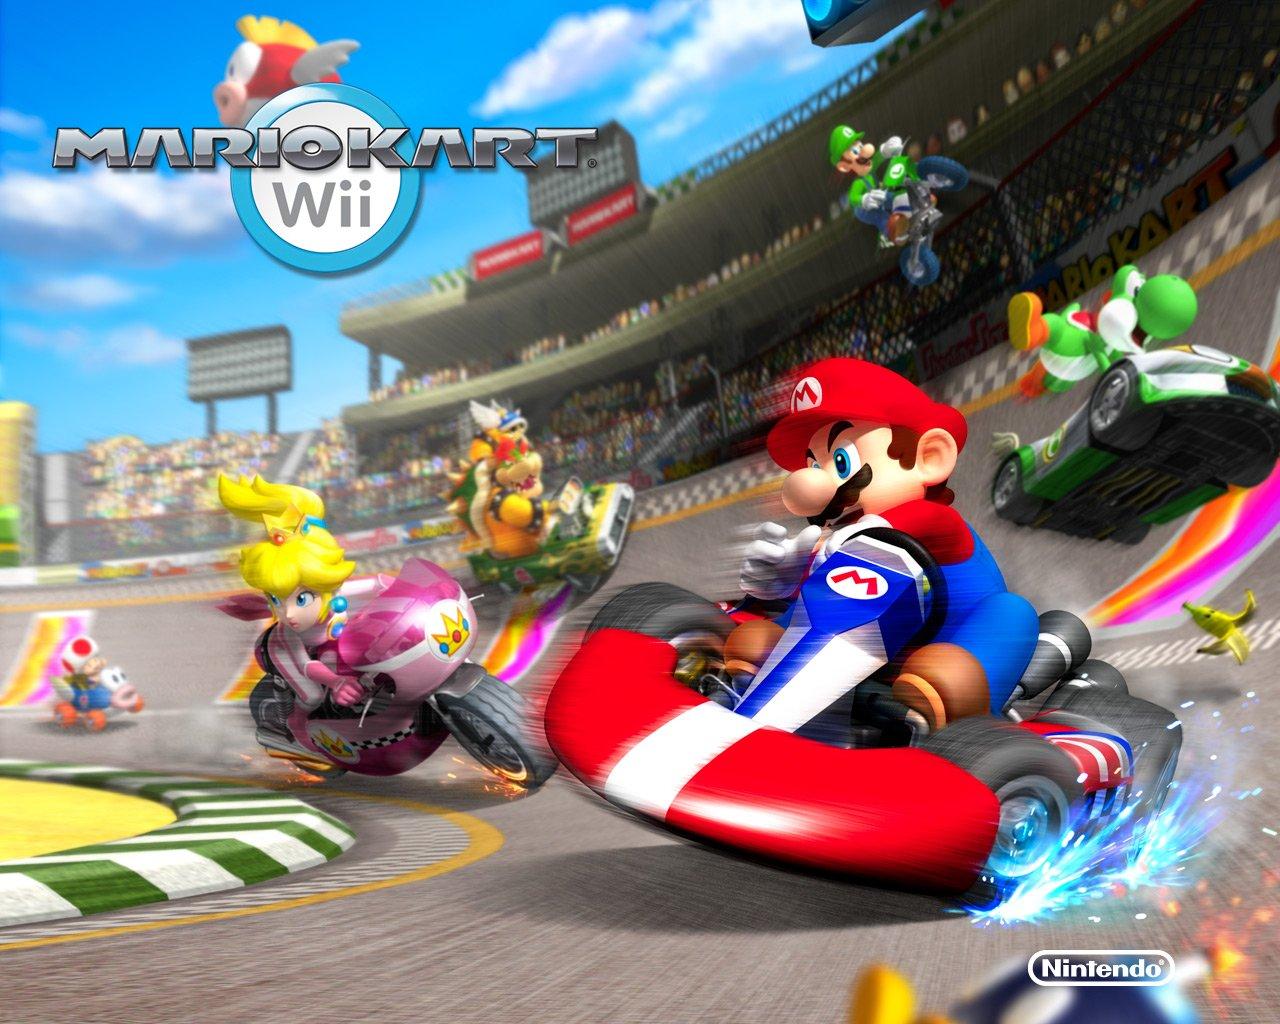 Mario Kart Wii - Game Only by Nintendo (Renewed) by Nintendo (Image #3)